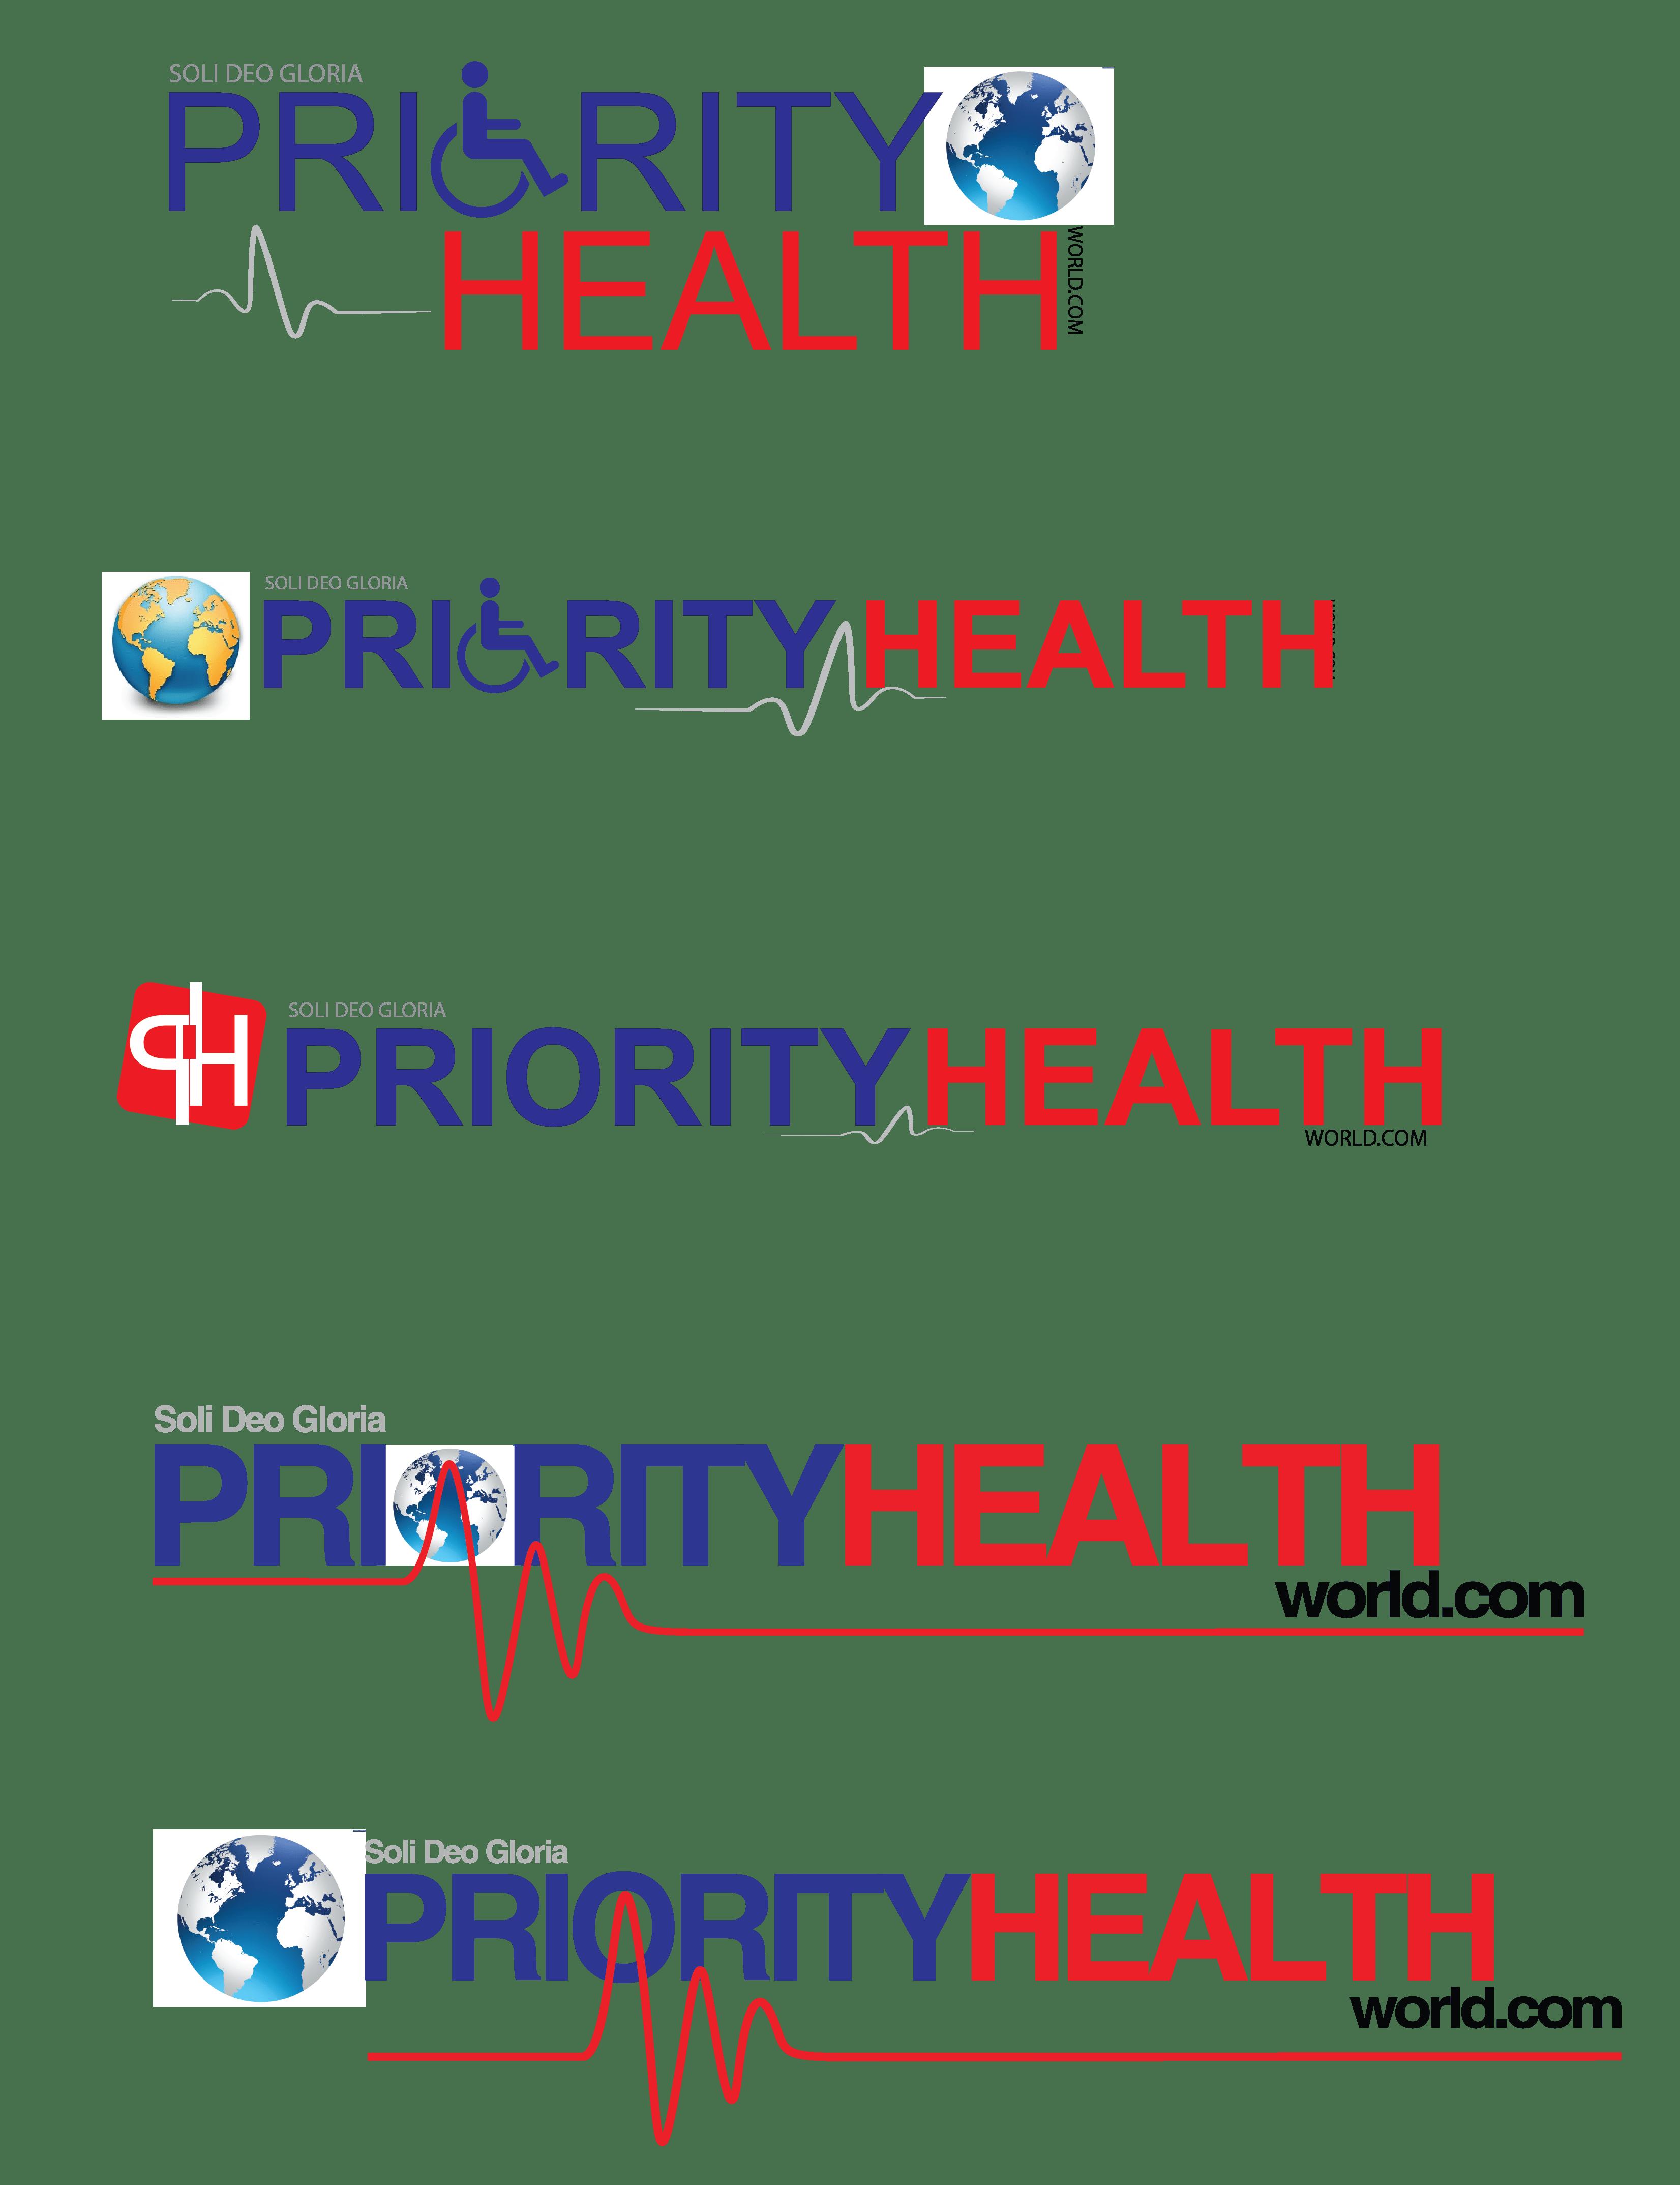 logo concept for priority health world  sri lanka